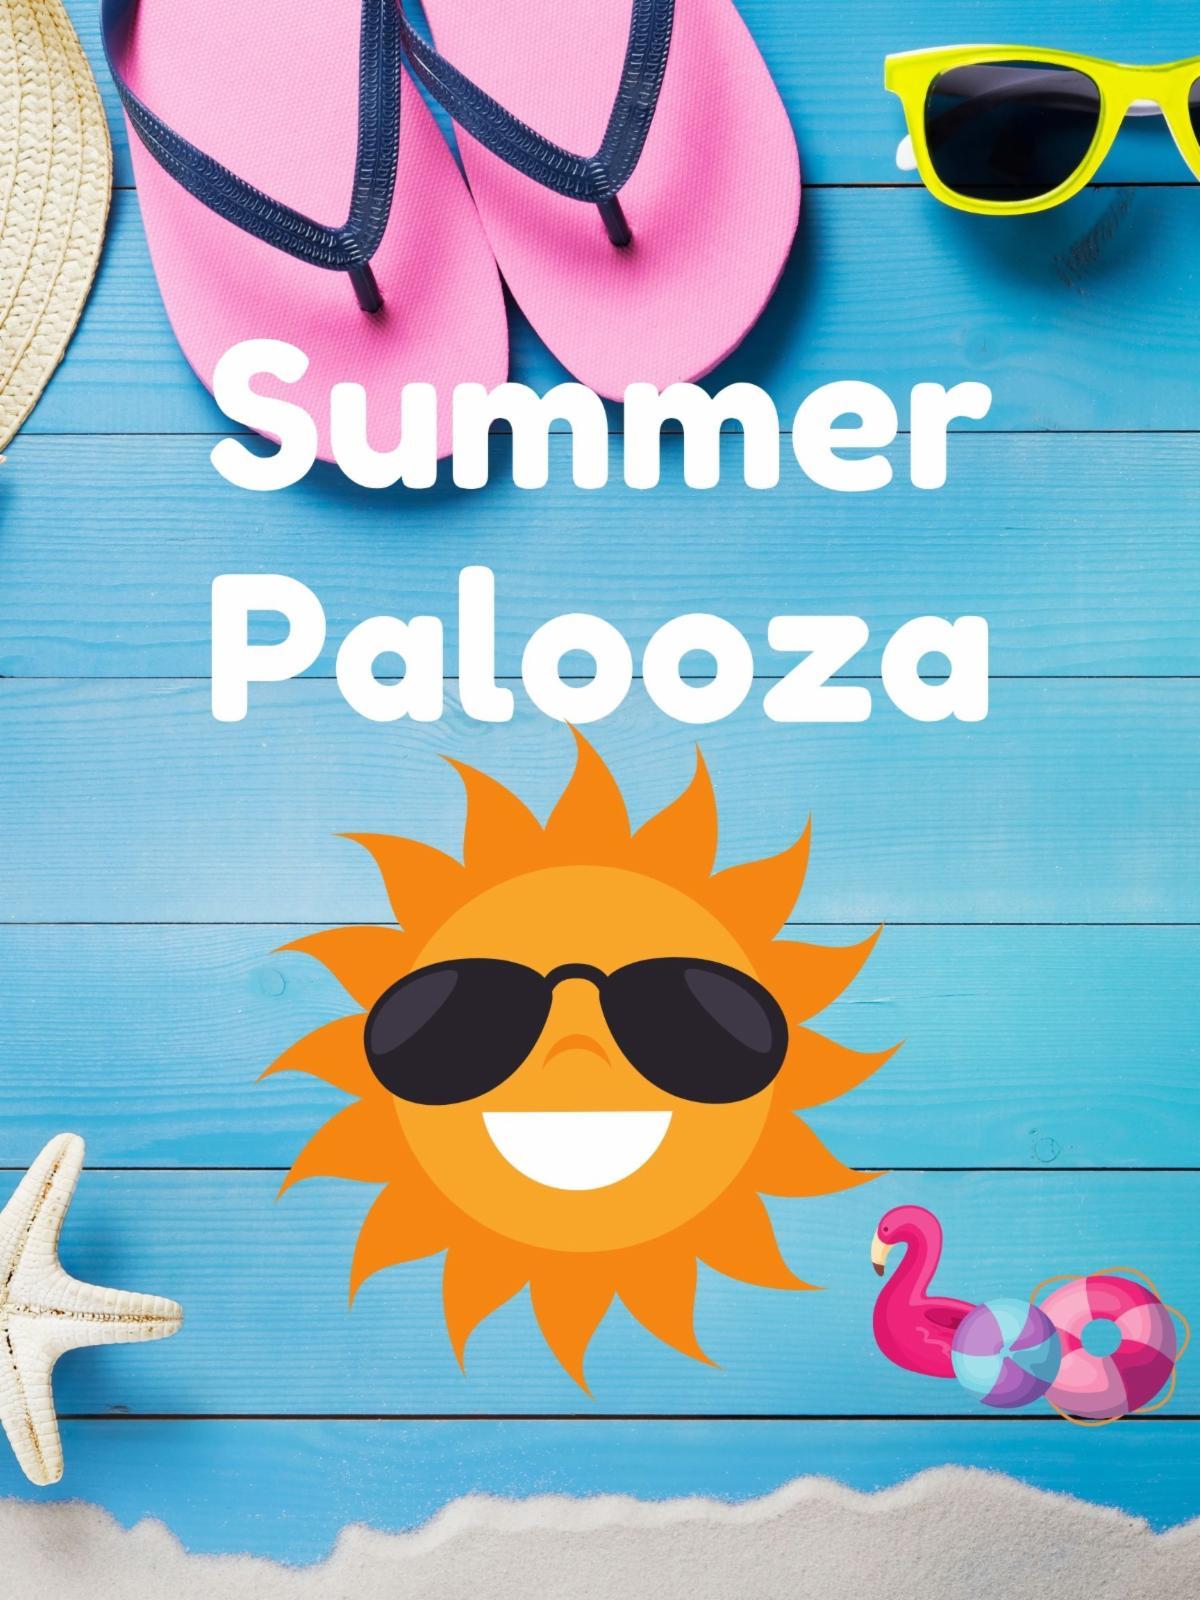 Summer Palooza.jpg